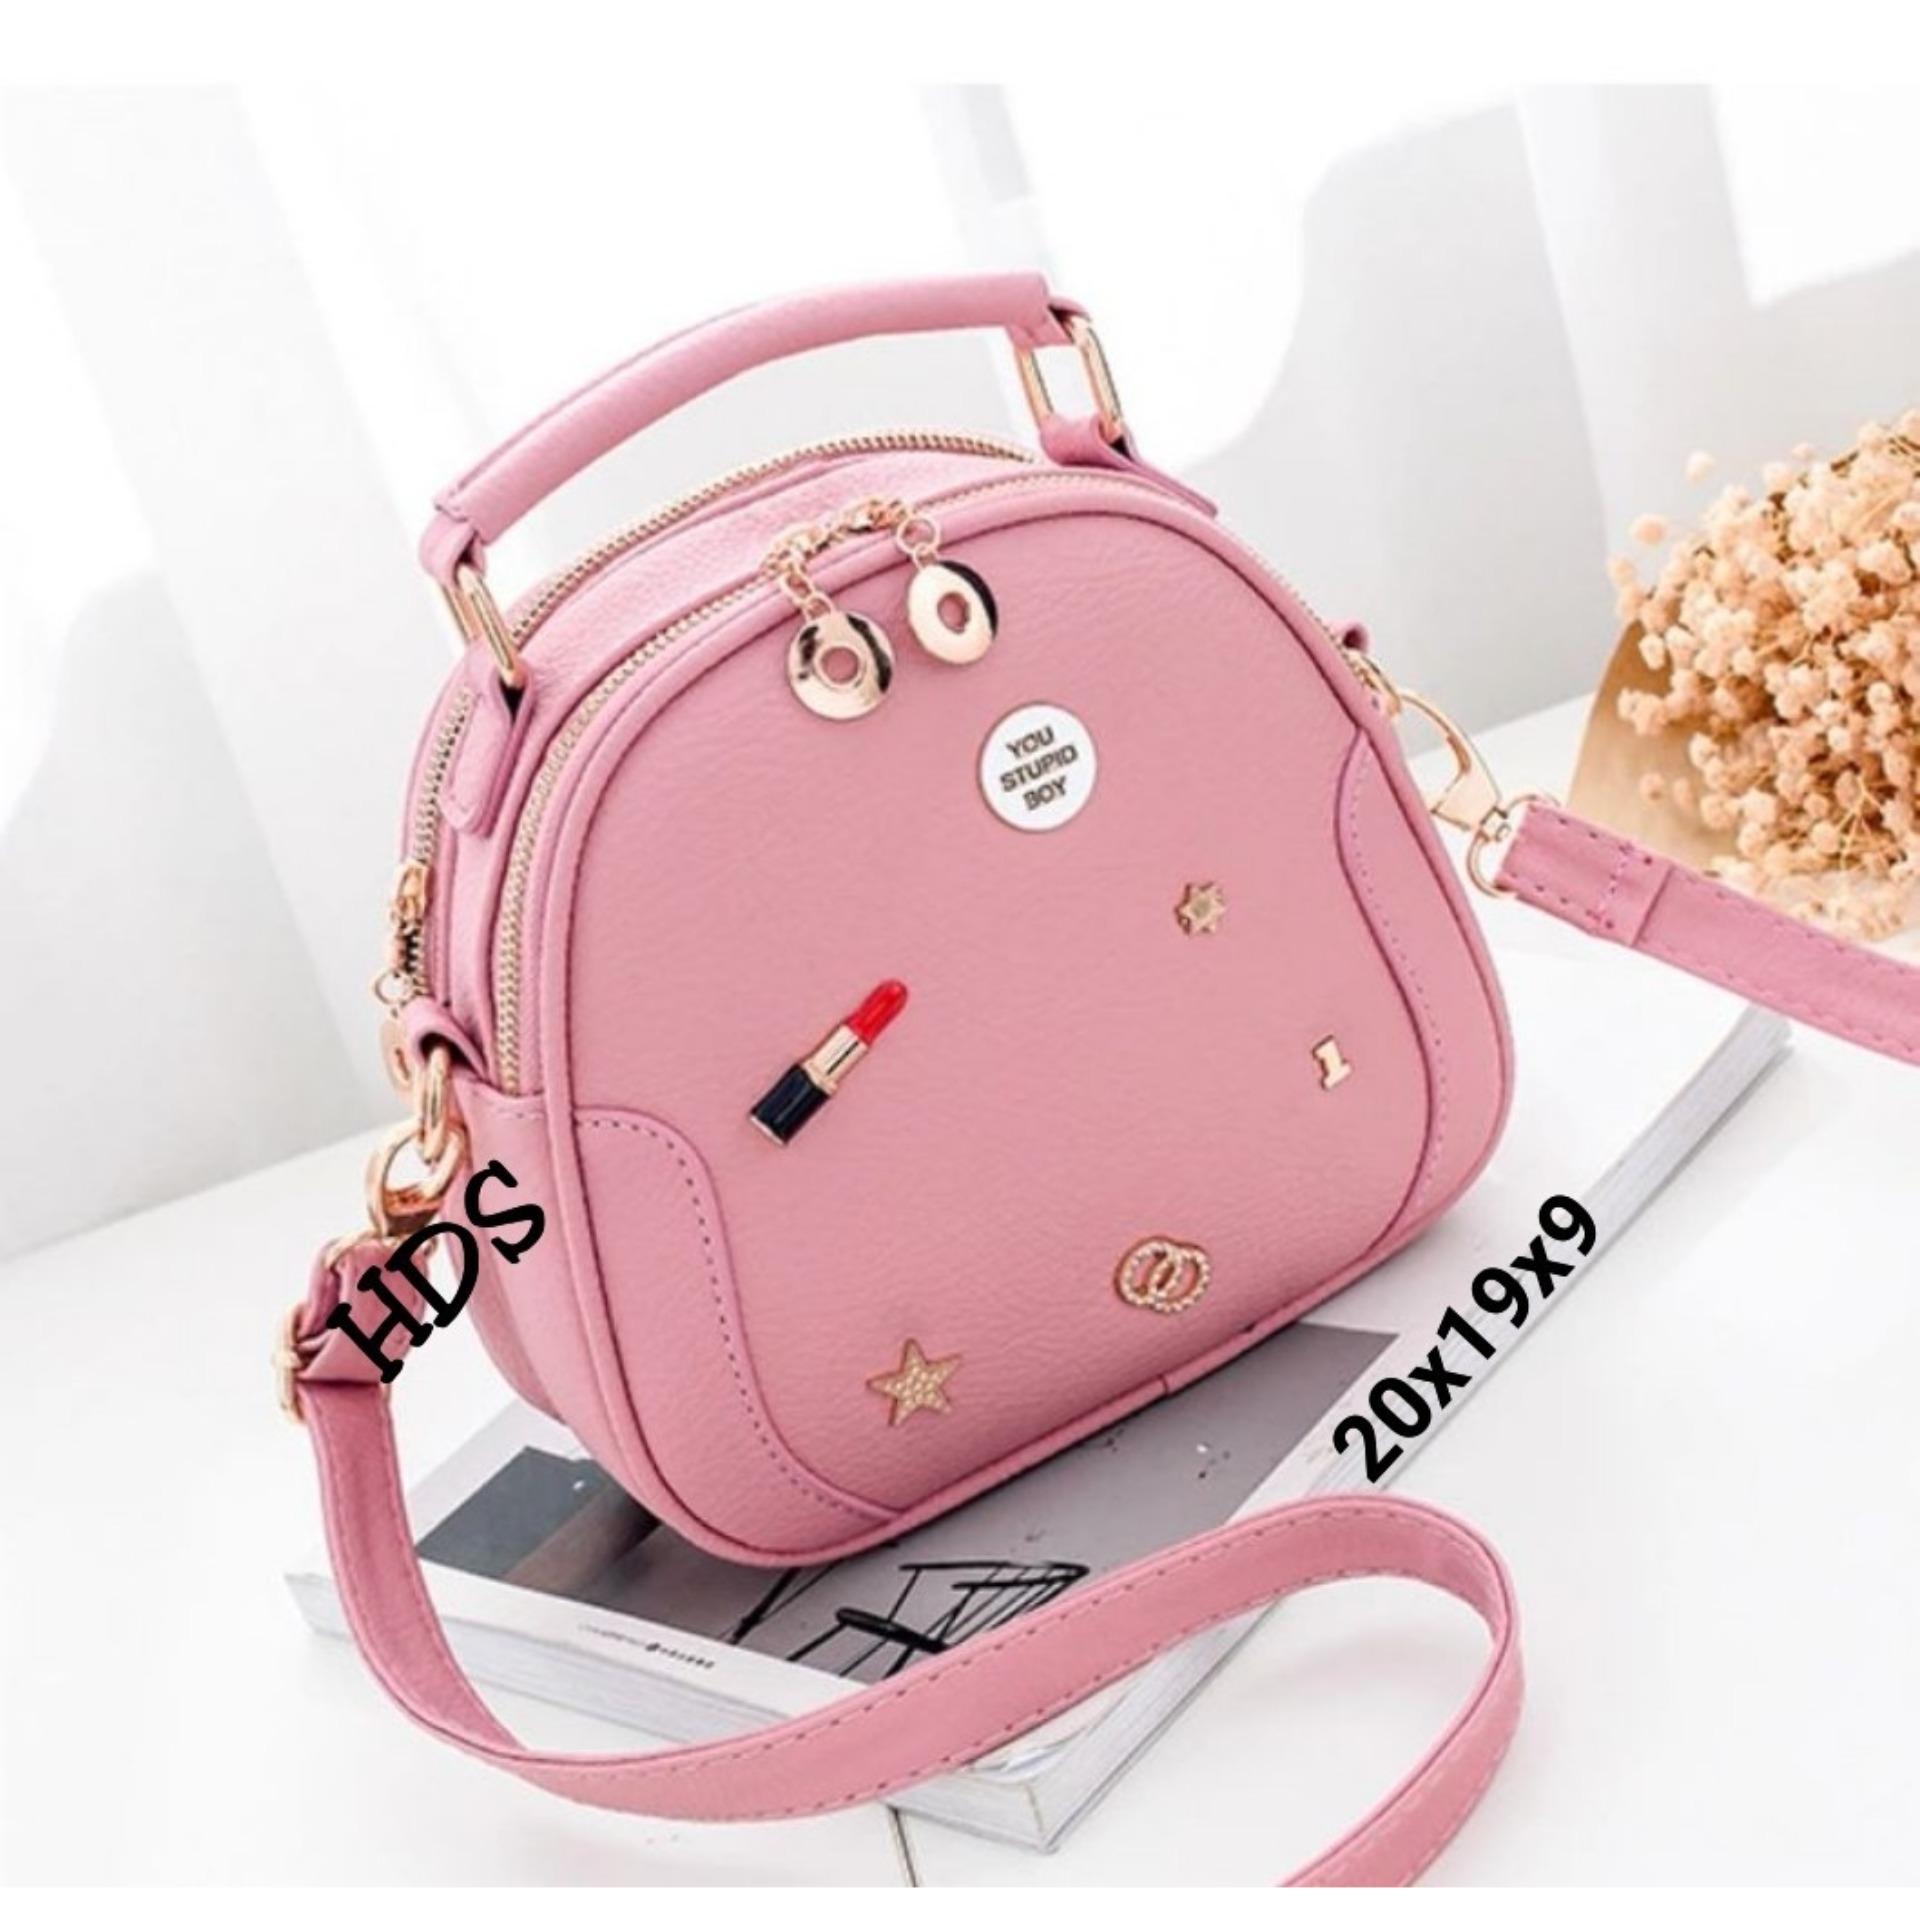 Sling Bag Korean Style Lipstick Flakes Ovale / Tas Selempang Wanita Korean Style - Pink